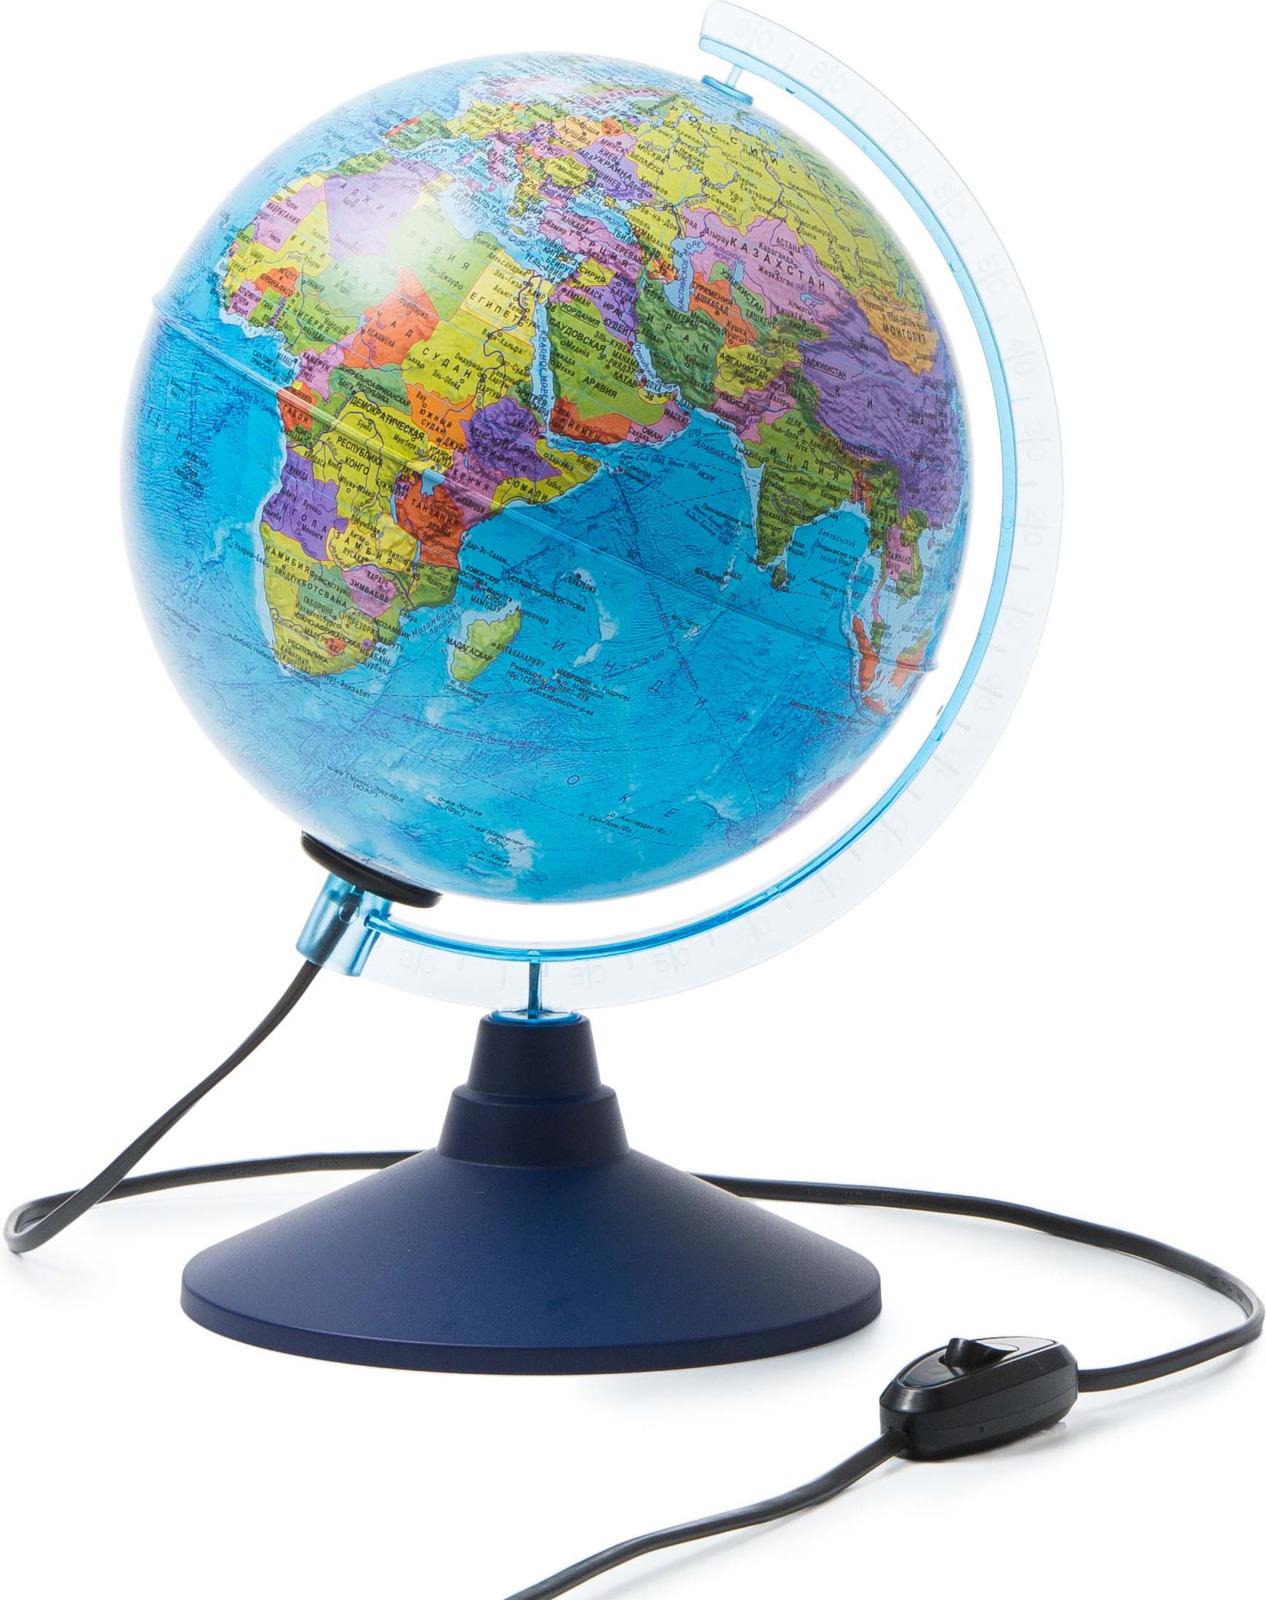 Globen Глобус Земли политический с подсветкой диаметр 210 мм Ке012100180 бемби dvd книга